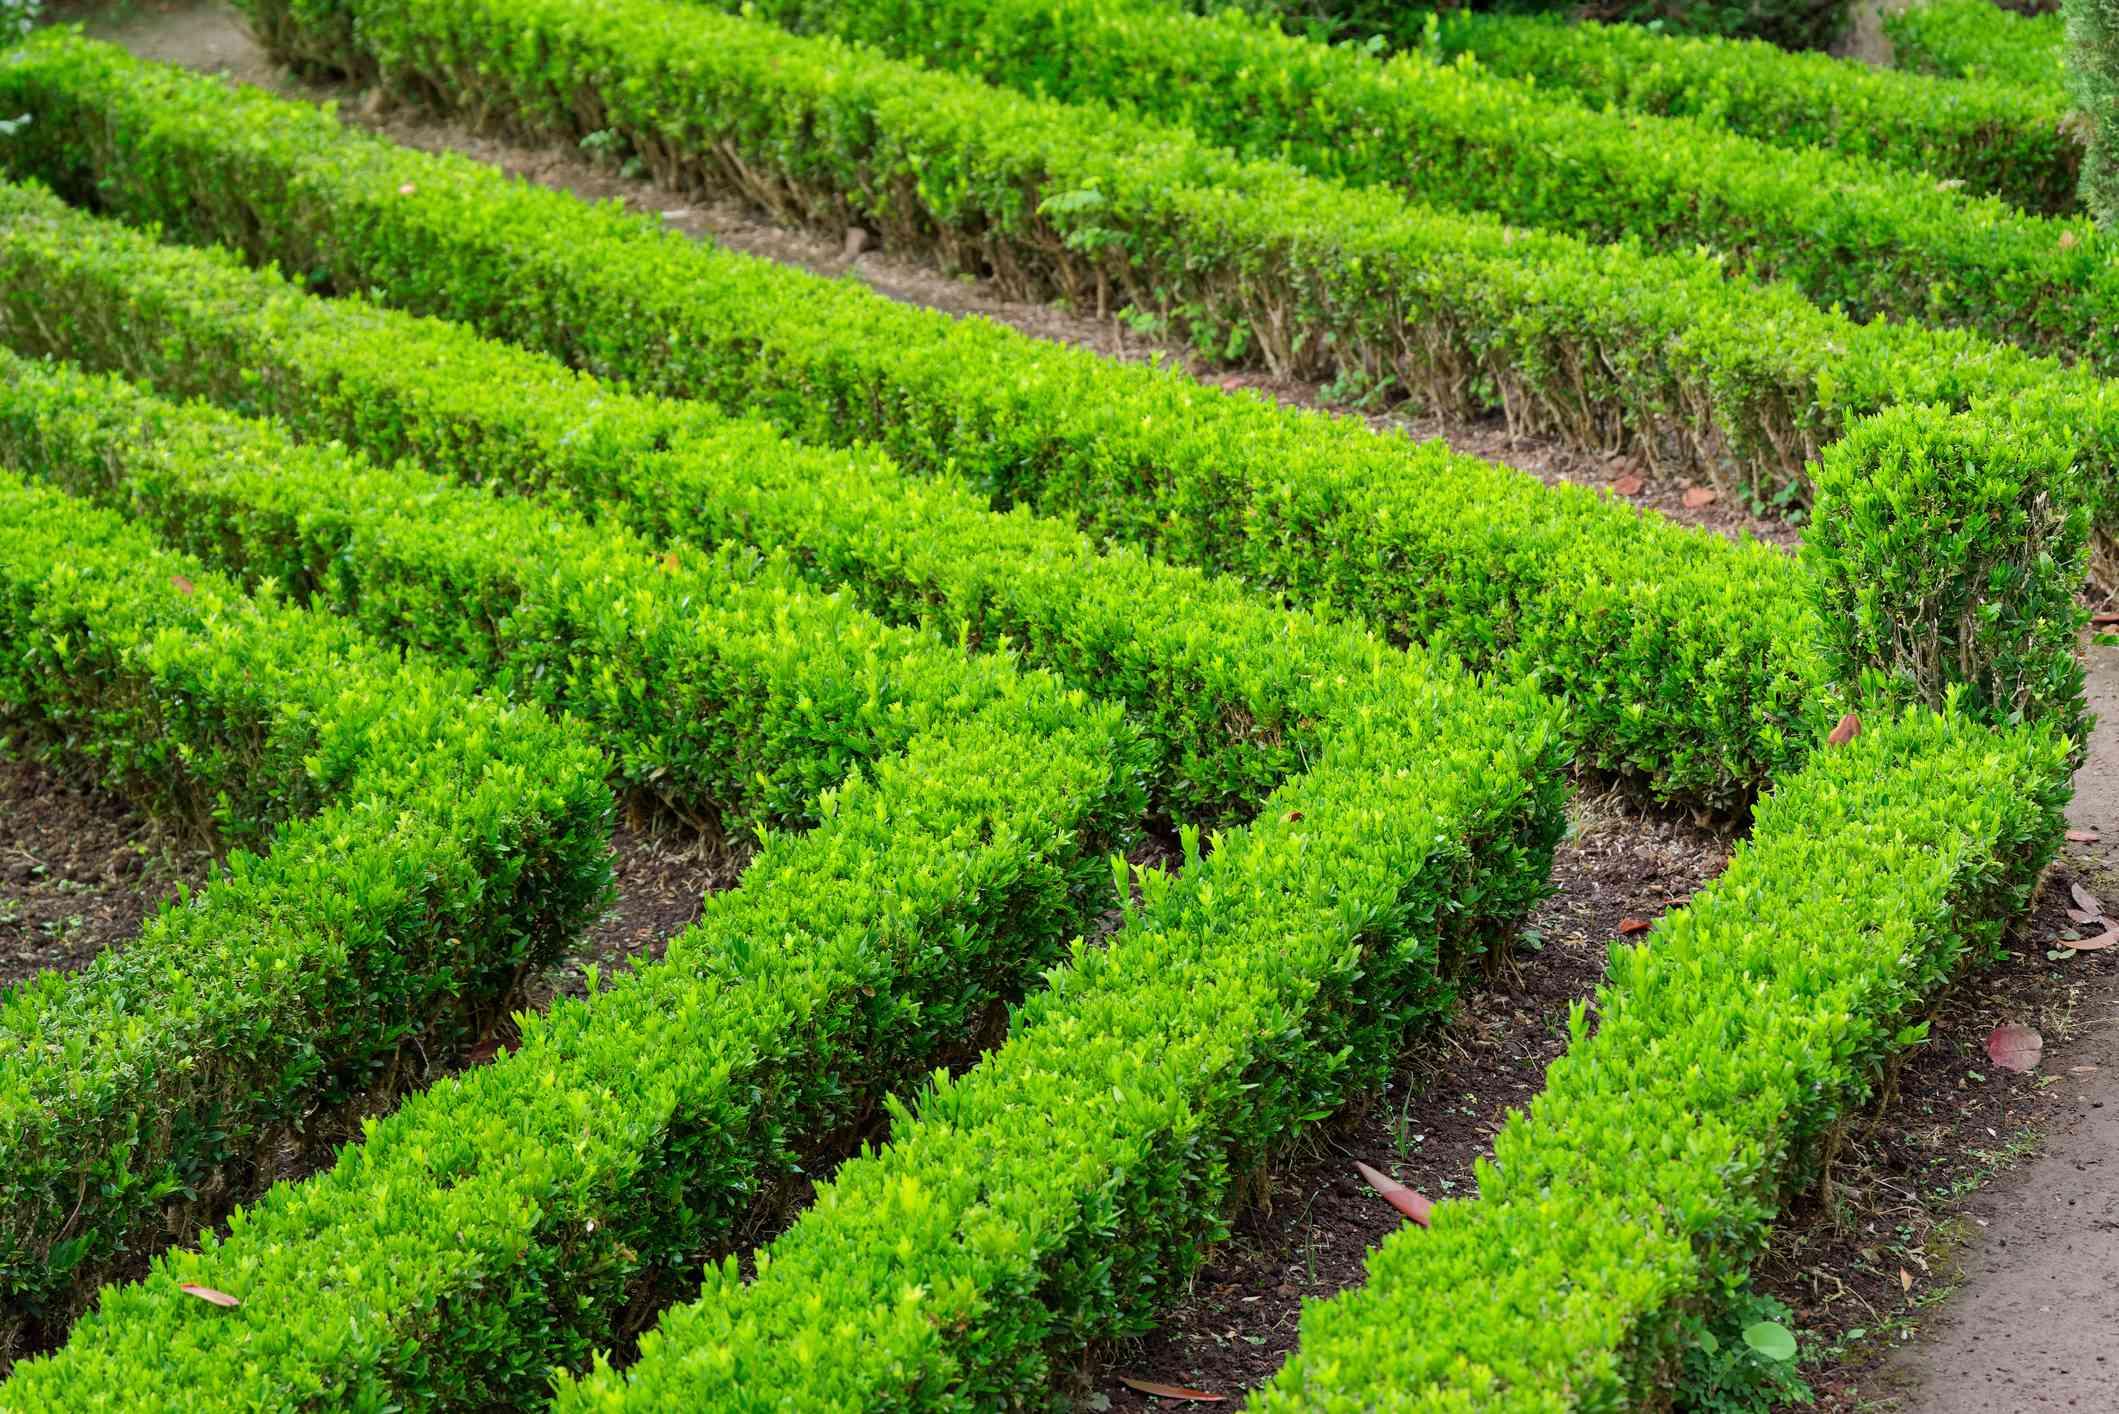 Ornamental rows of manicured boxwood shrubs